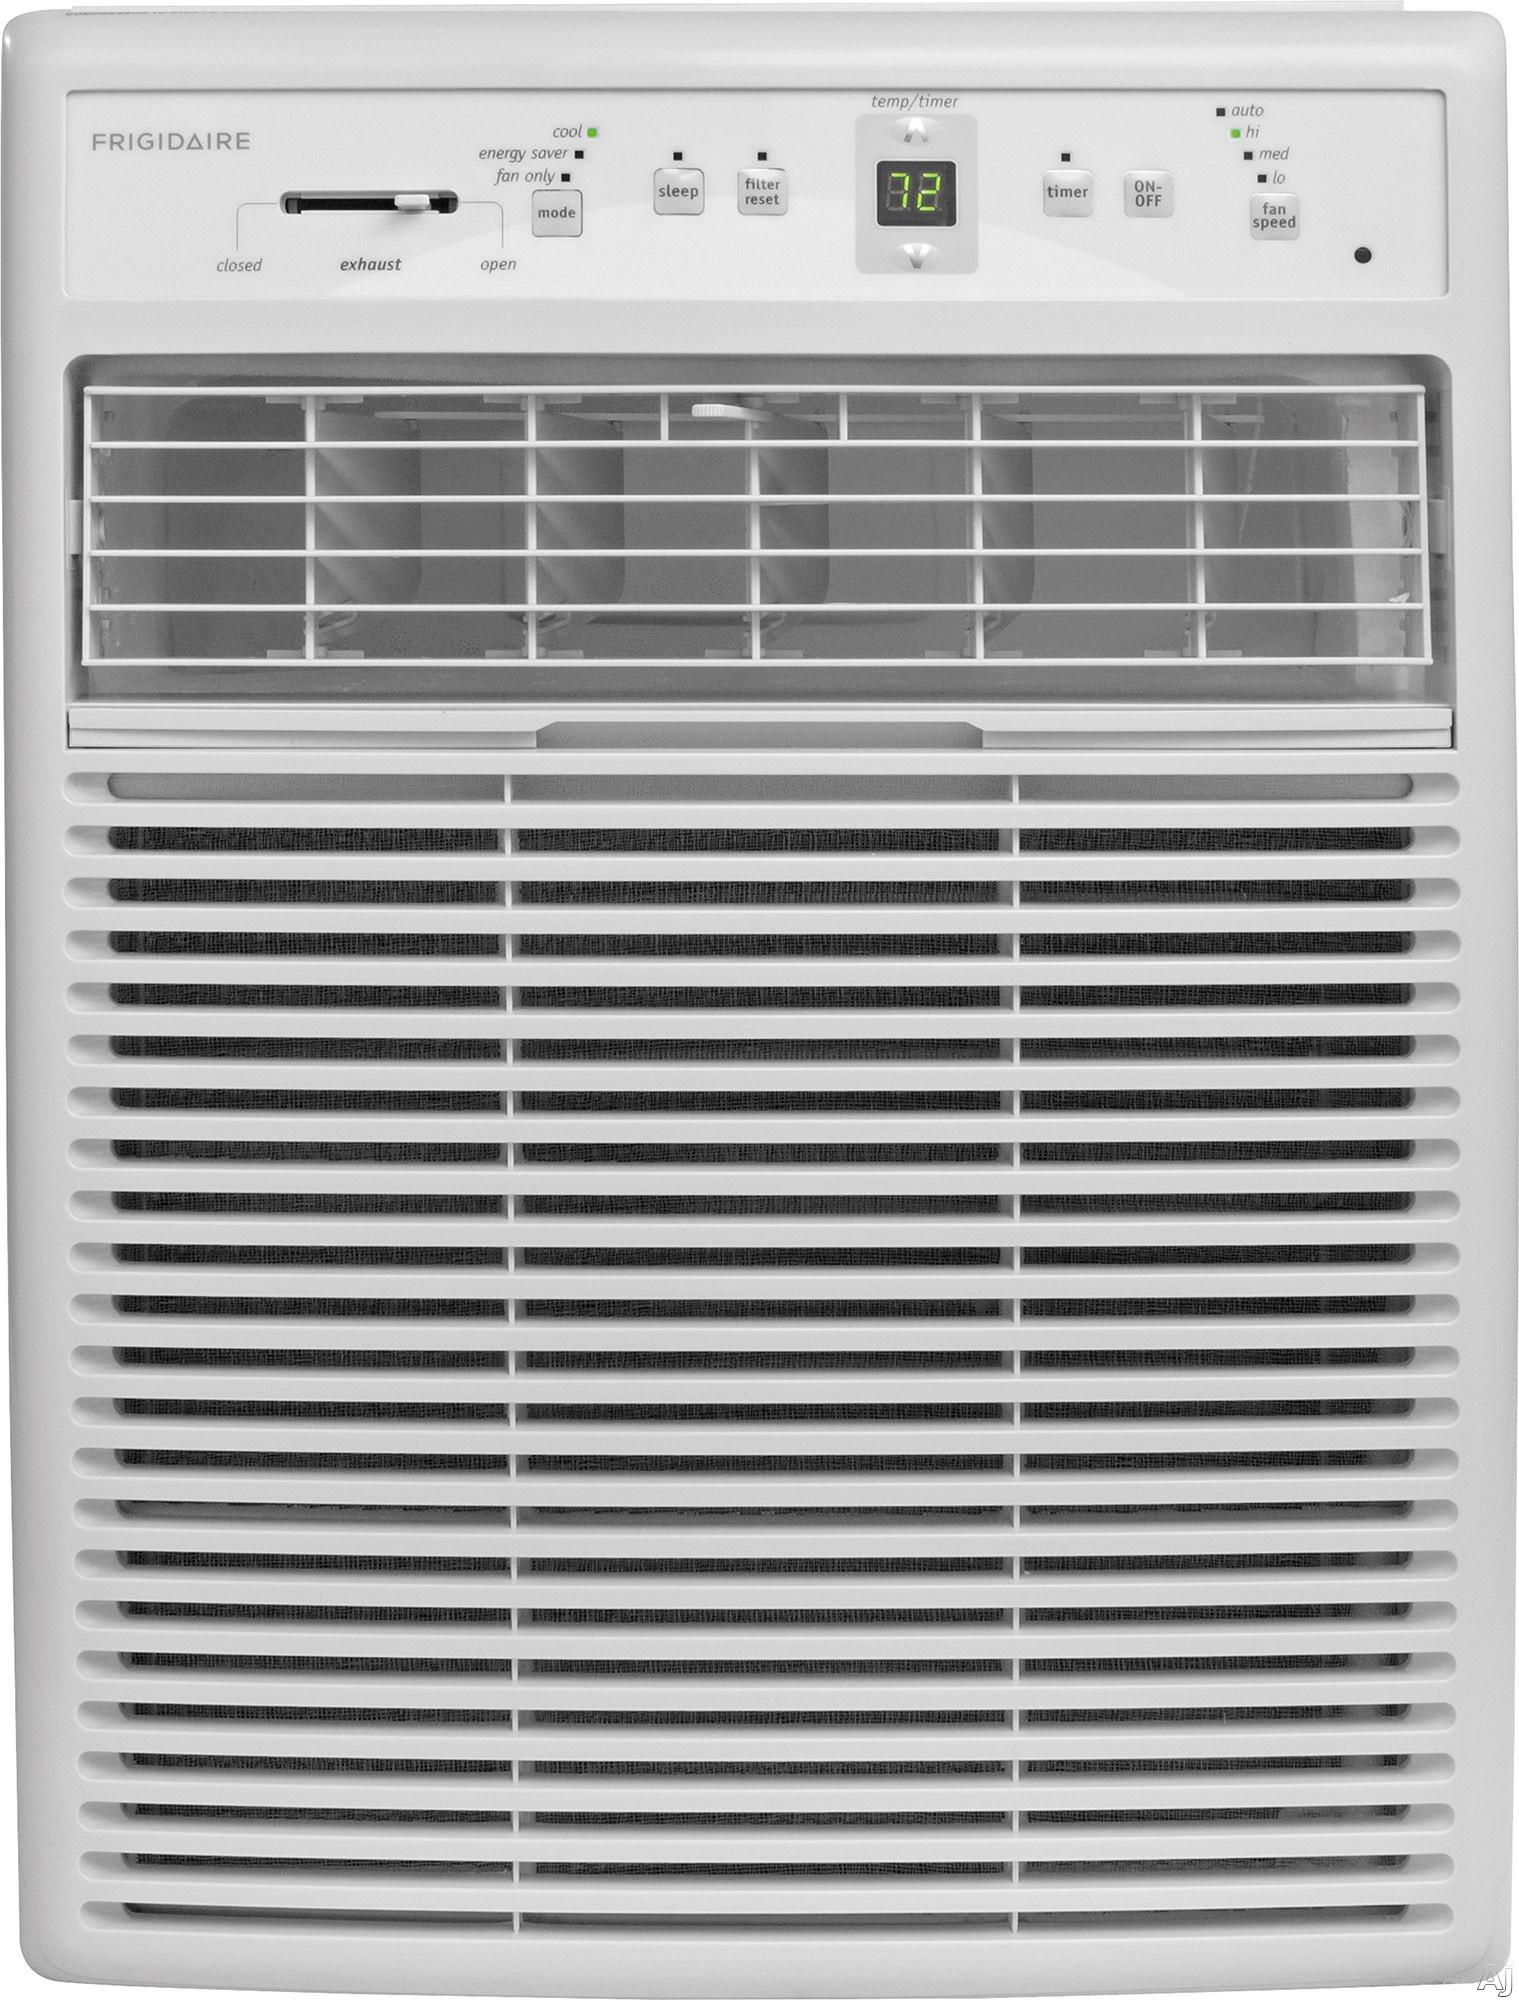 Frigidaire FFRS0822S1 8,000 BTU Room Air Conditioner with 263 CFM, 3 Fan Speeds, Effortless Temperature Control, 24-Hour Timer, Energy Saver Mode, Effortless Restart, Clean Filter Alert, SpaceWise Adj